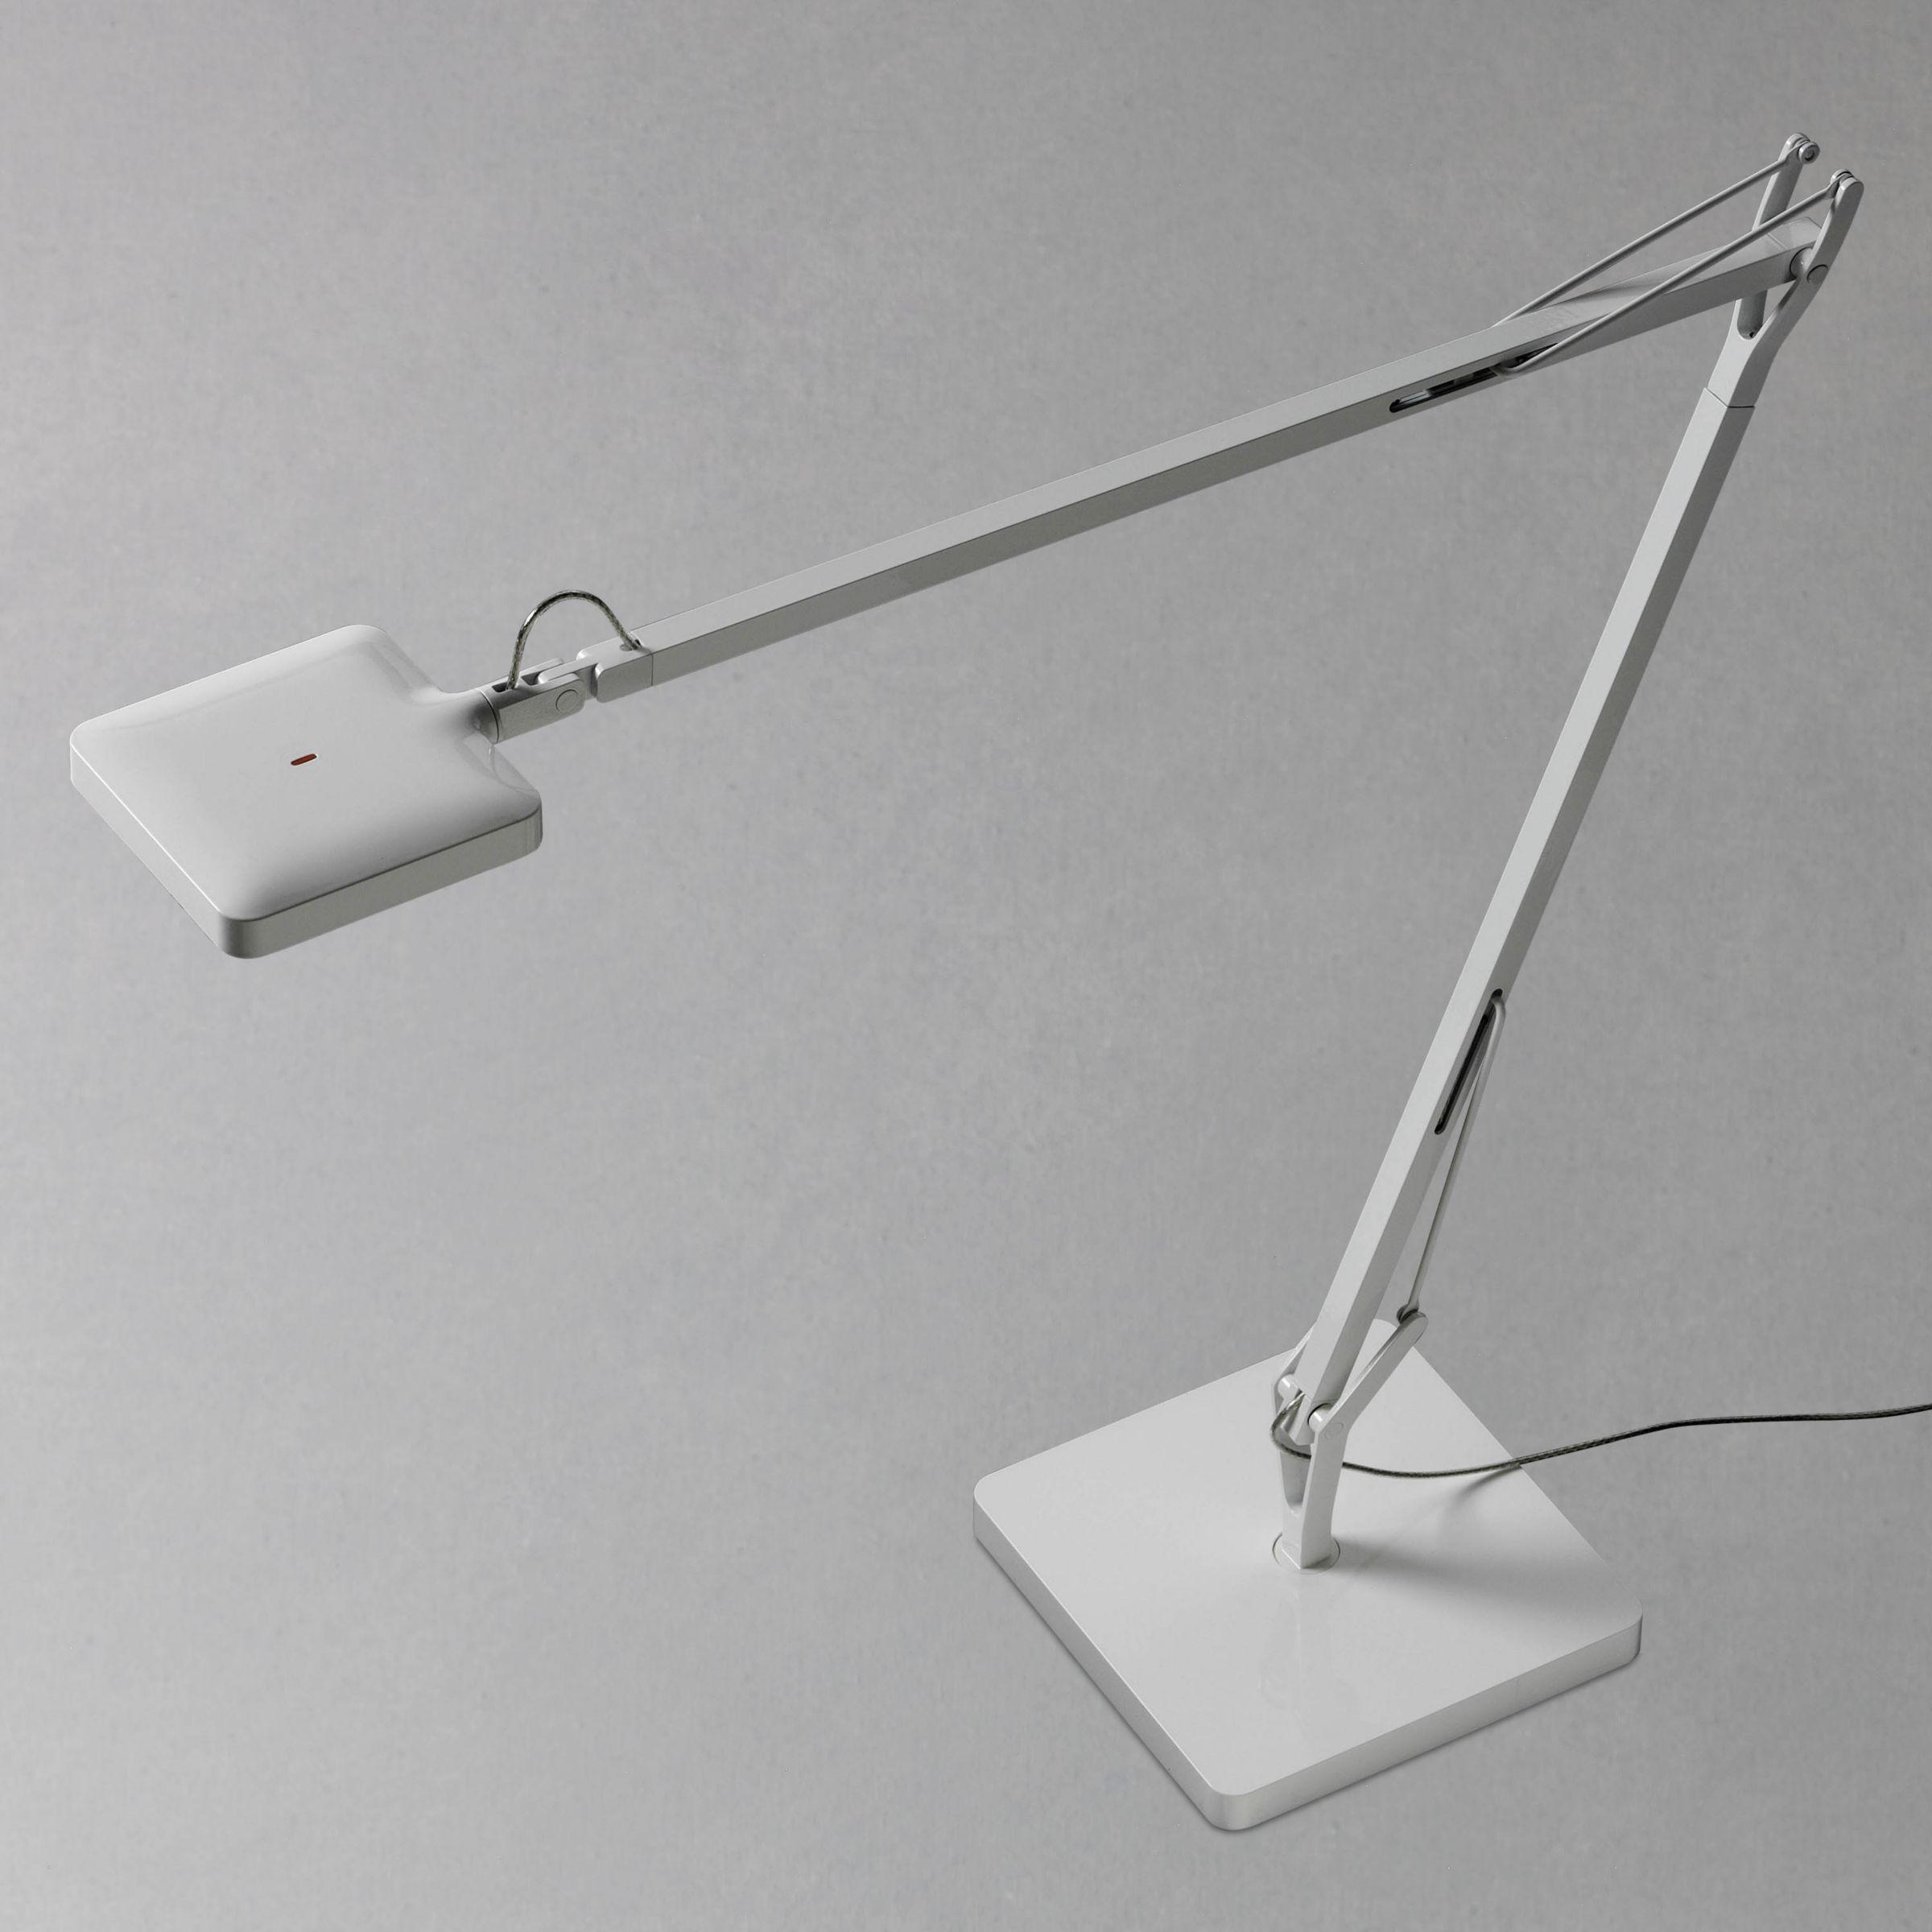 Flos Kelvin LED Task Lamp, White at JohnLewis